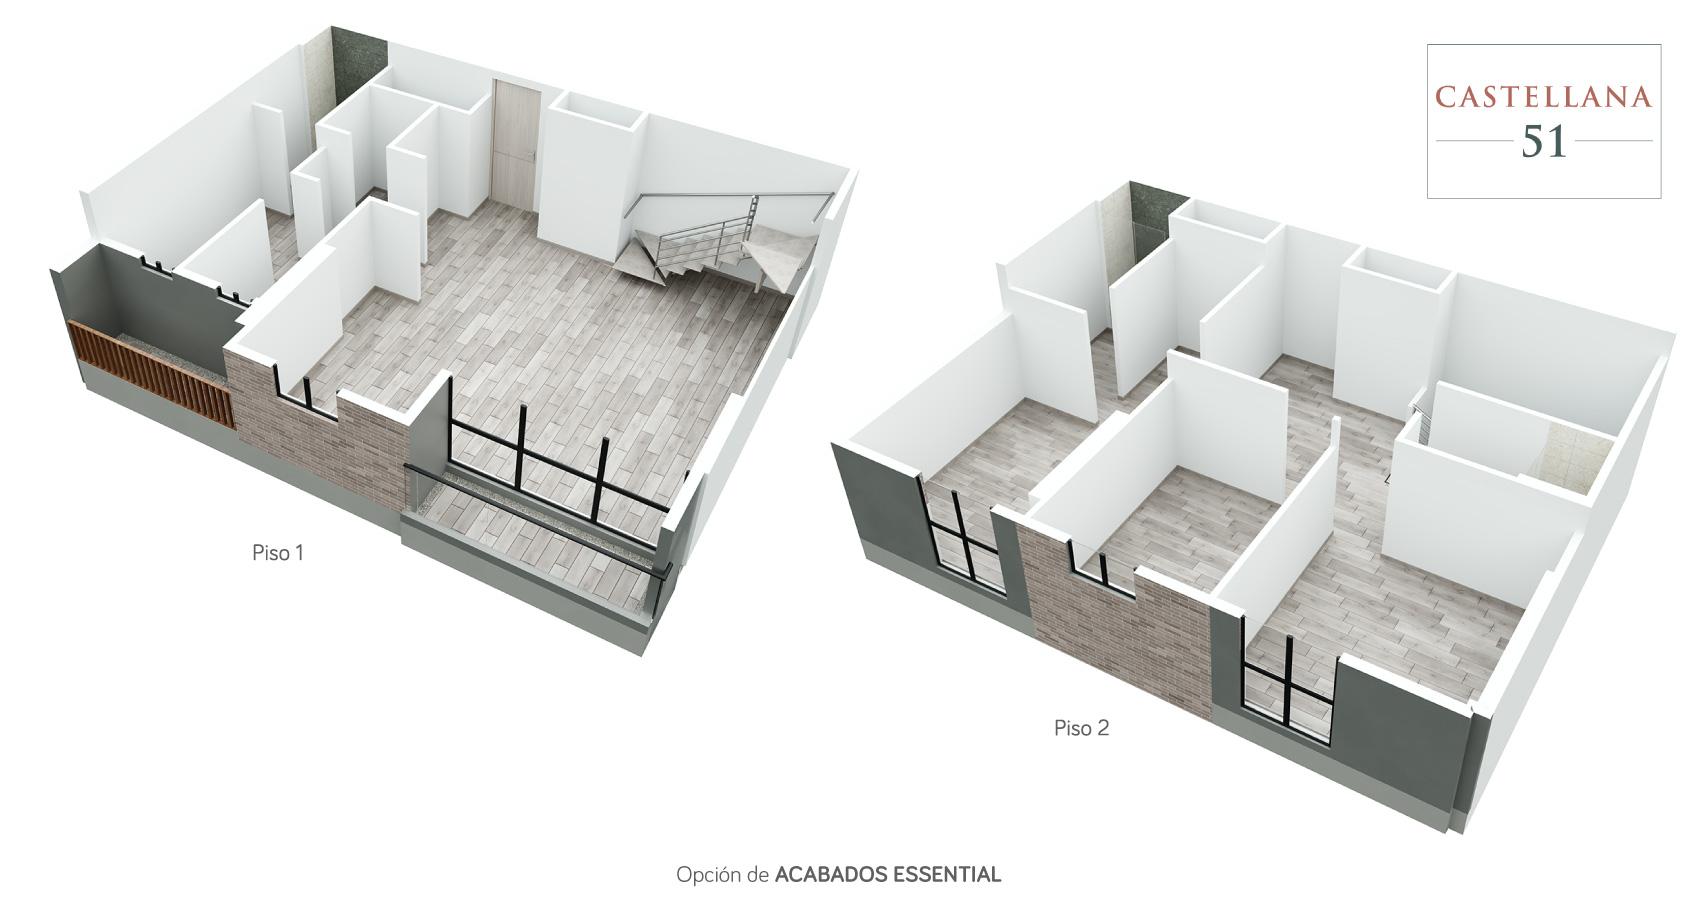 Castellana 51 apartamentos Barranquilla Constructora Bolívar Vivienda